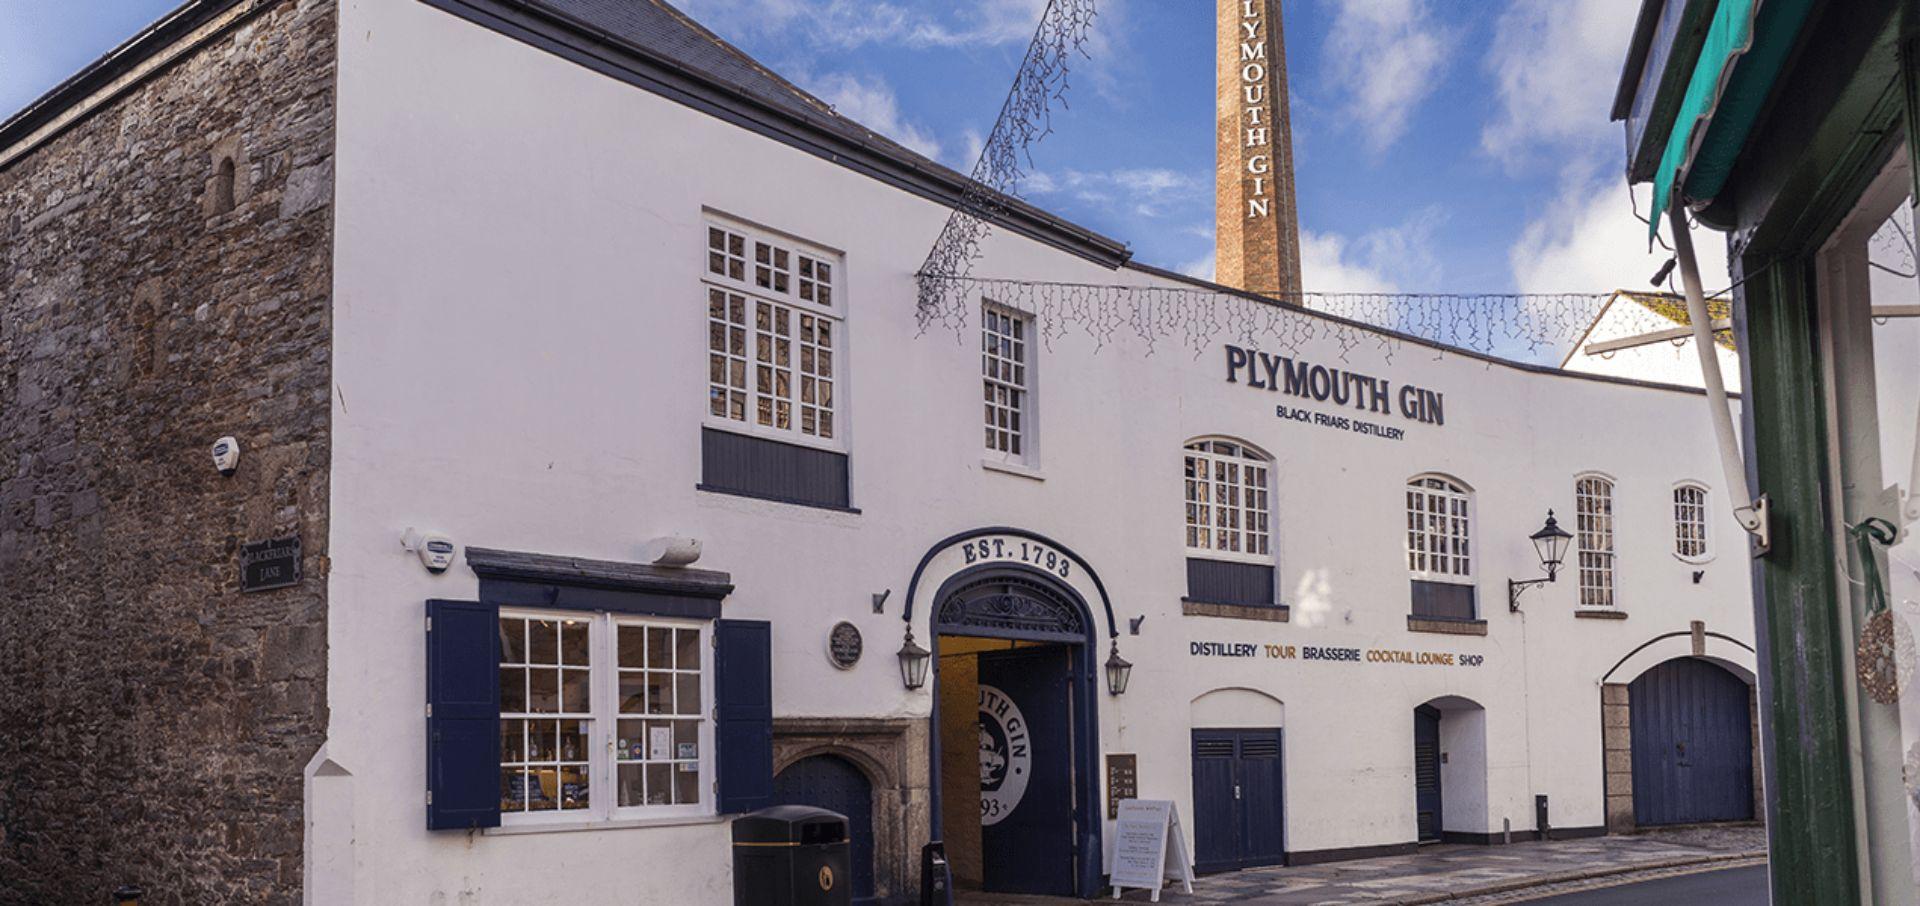 Plymouth Gin Distillery